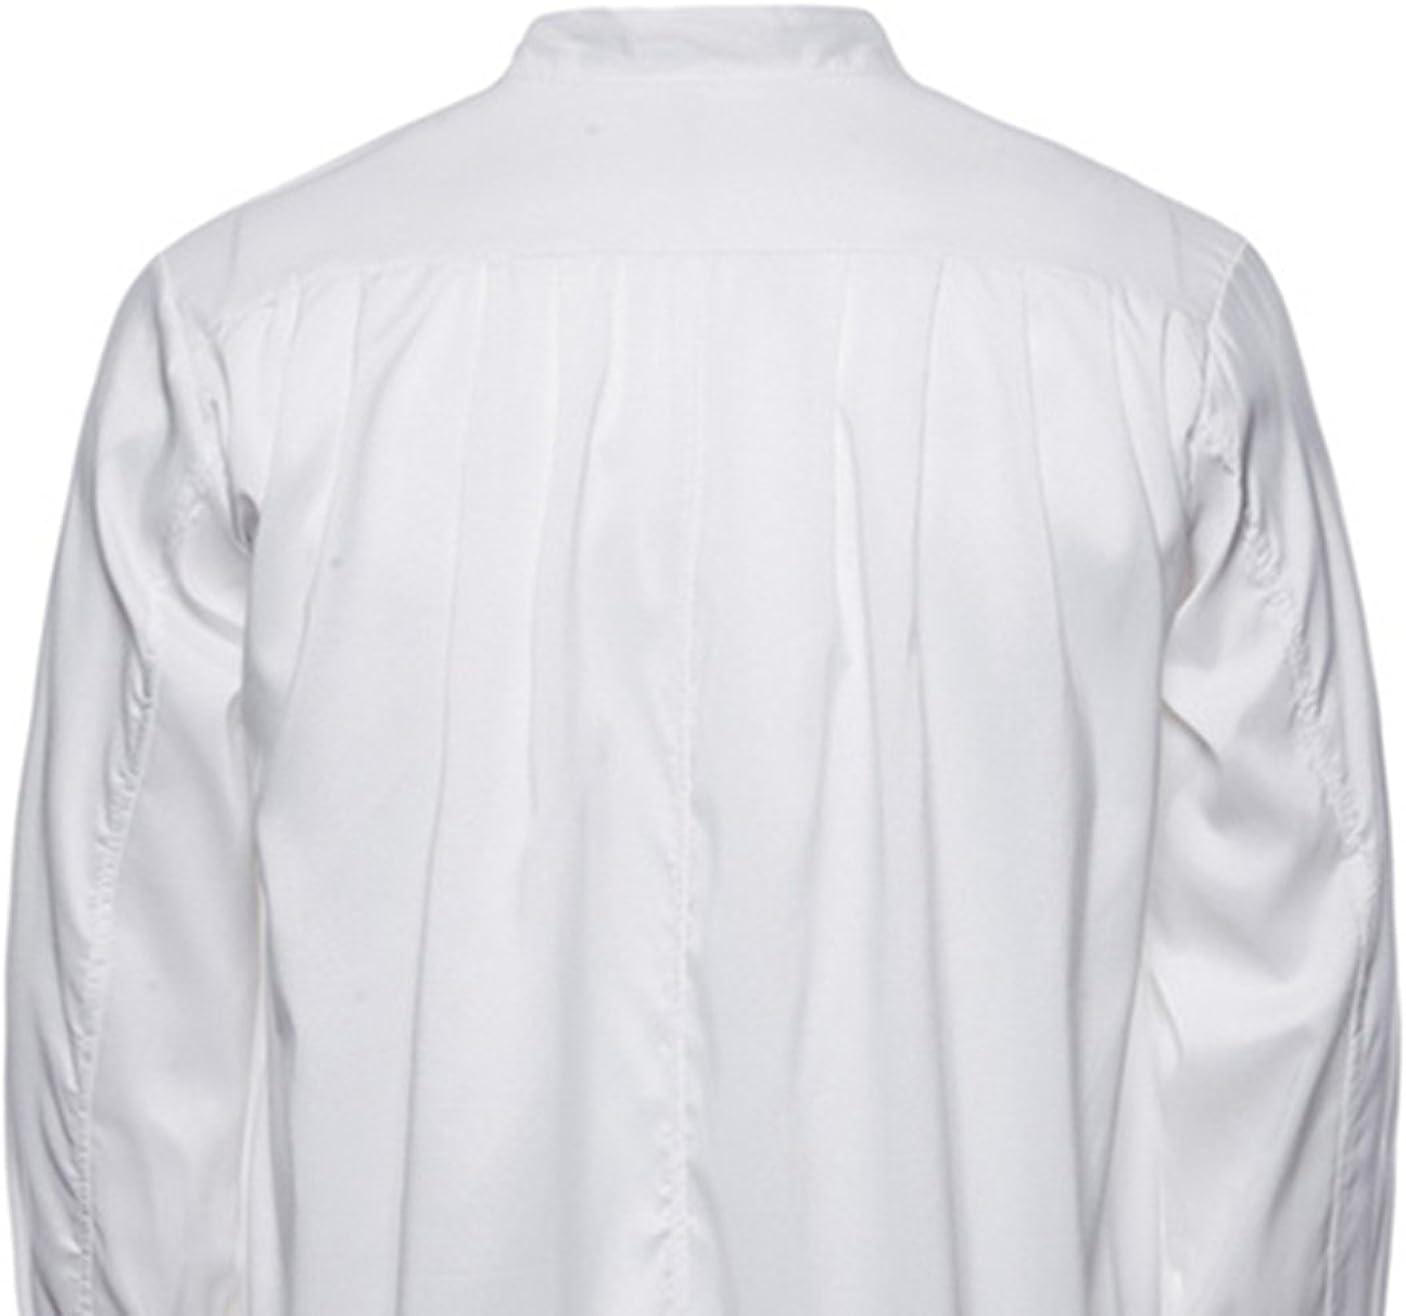 Camisa de Verano para Hombres Camisa Informal Simple de Manga ...